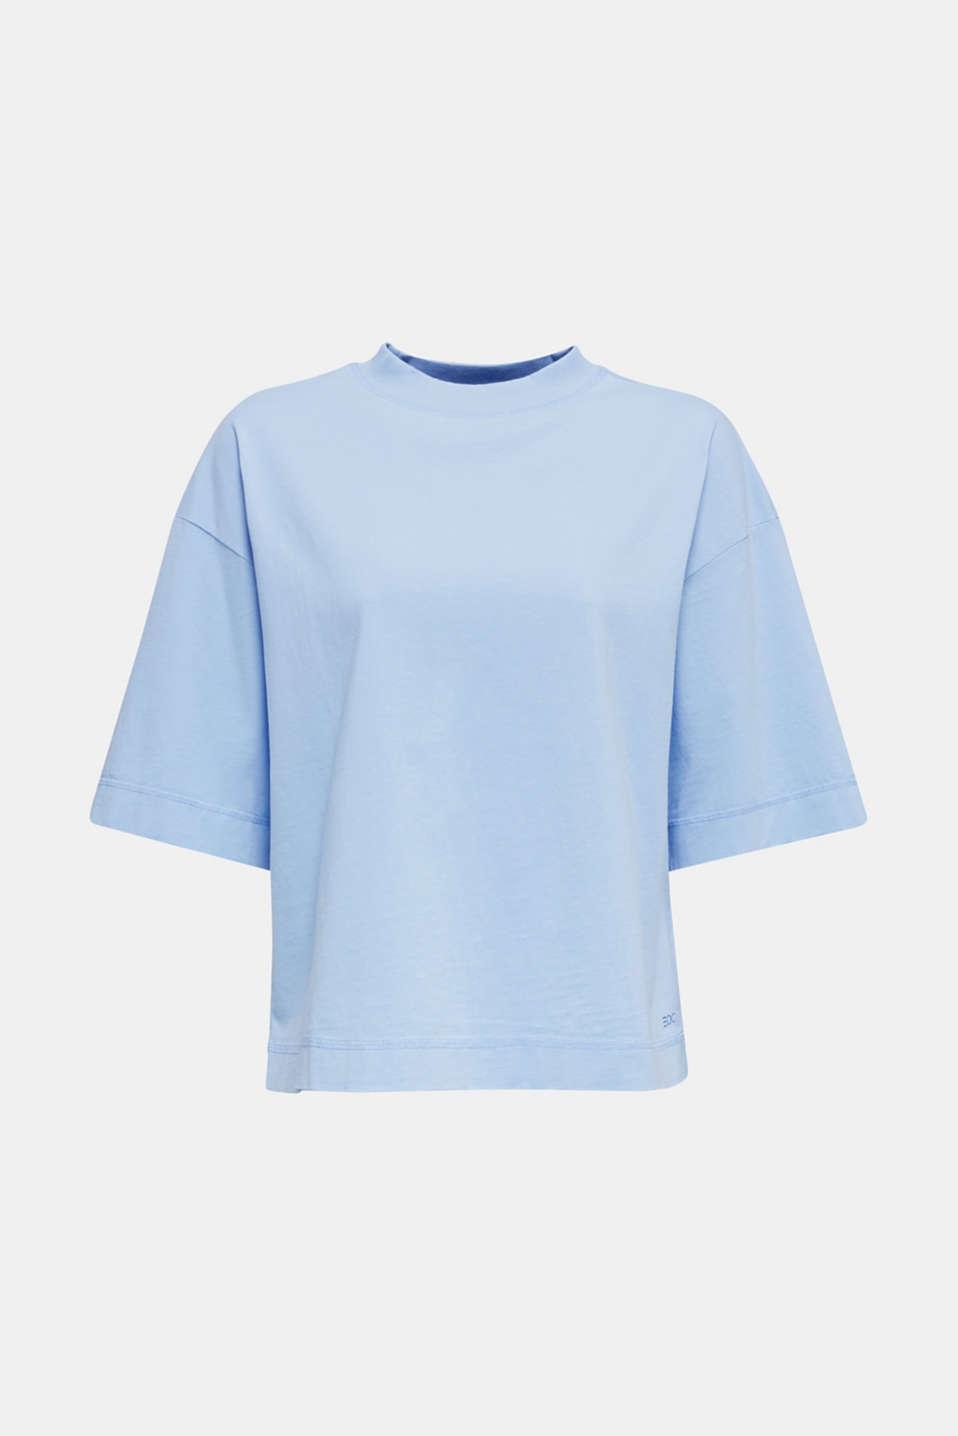 Loose T-shirt in 100% cotton, BLUE LAVENDER 4, detail image number 6